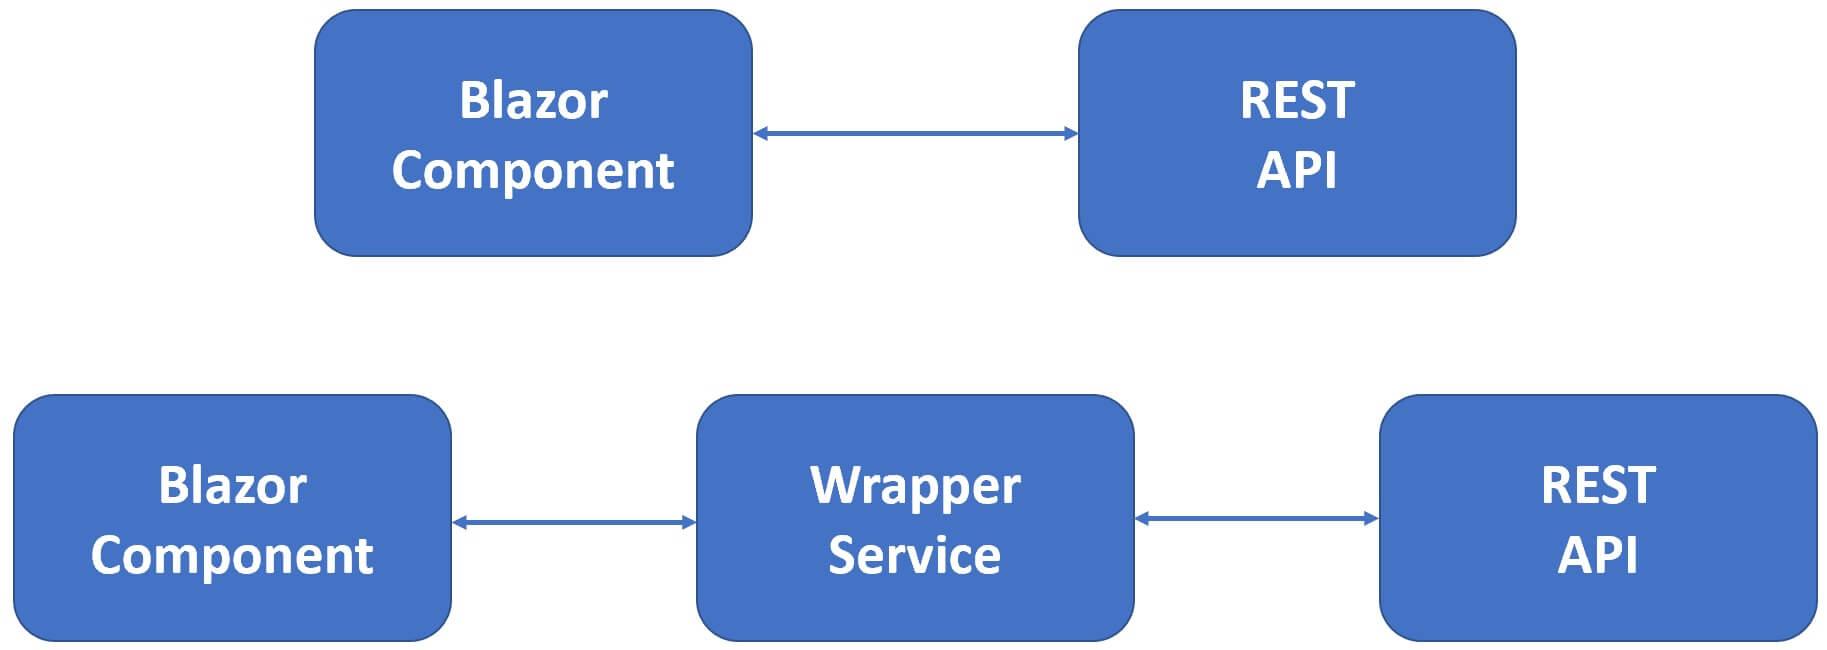 blazor webassembly httpclient example